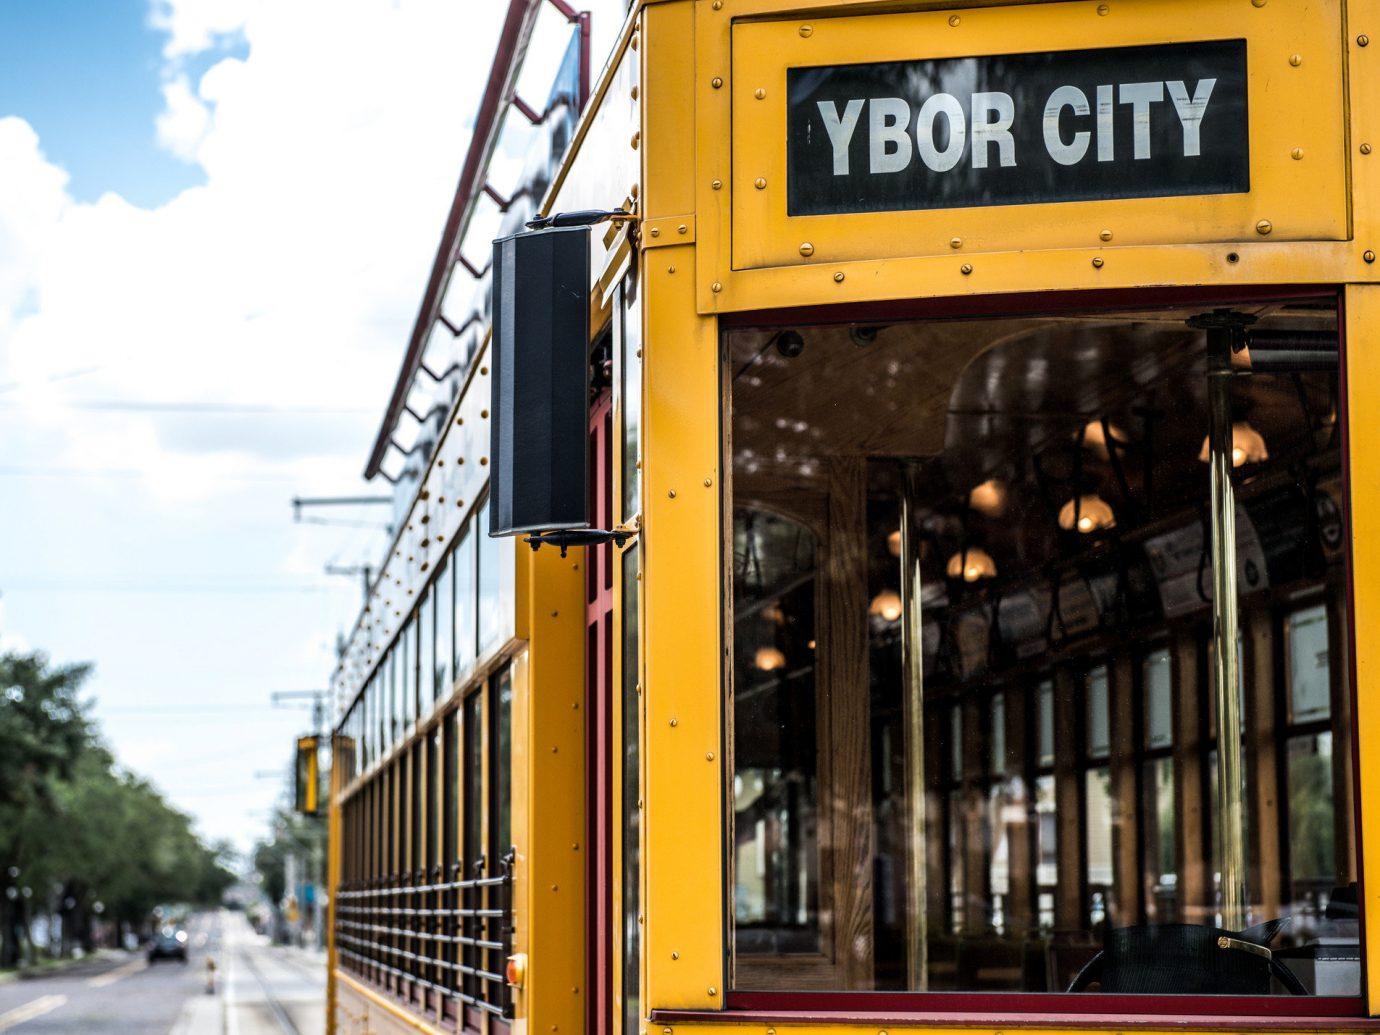 Trip Ideas outdoor sky yellow transport vehicle rolling stock public transport train bus tram railroad car